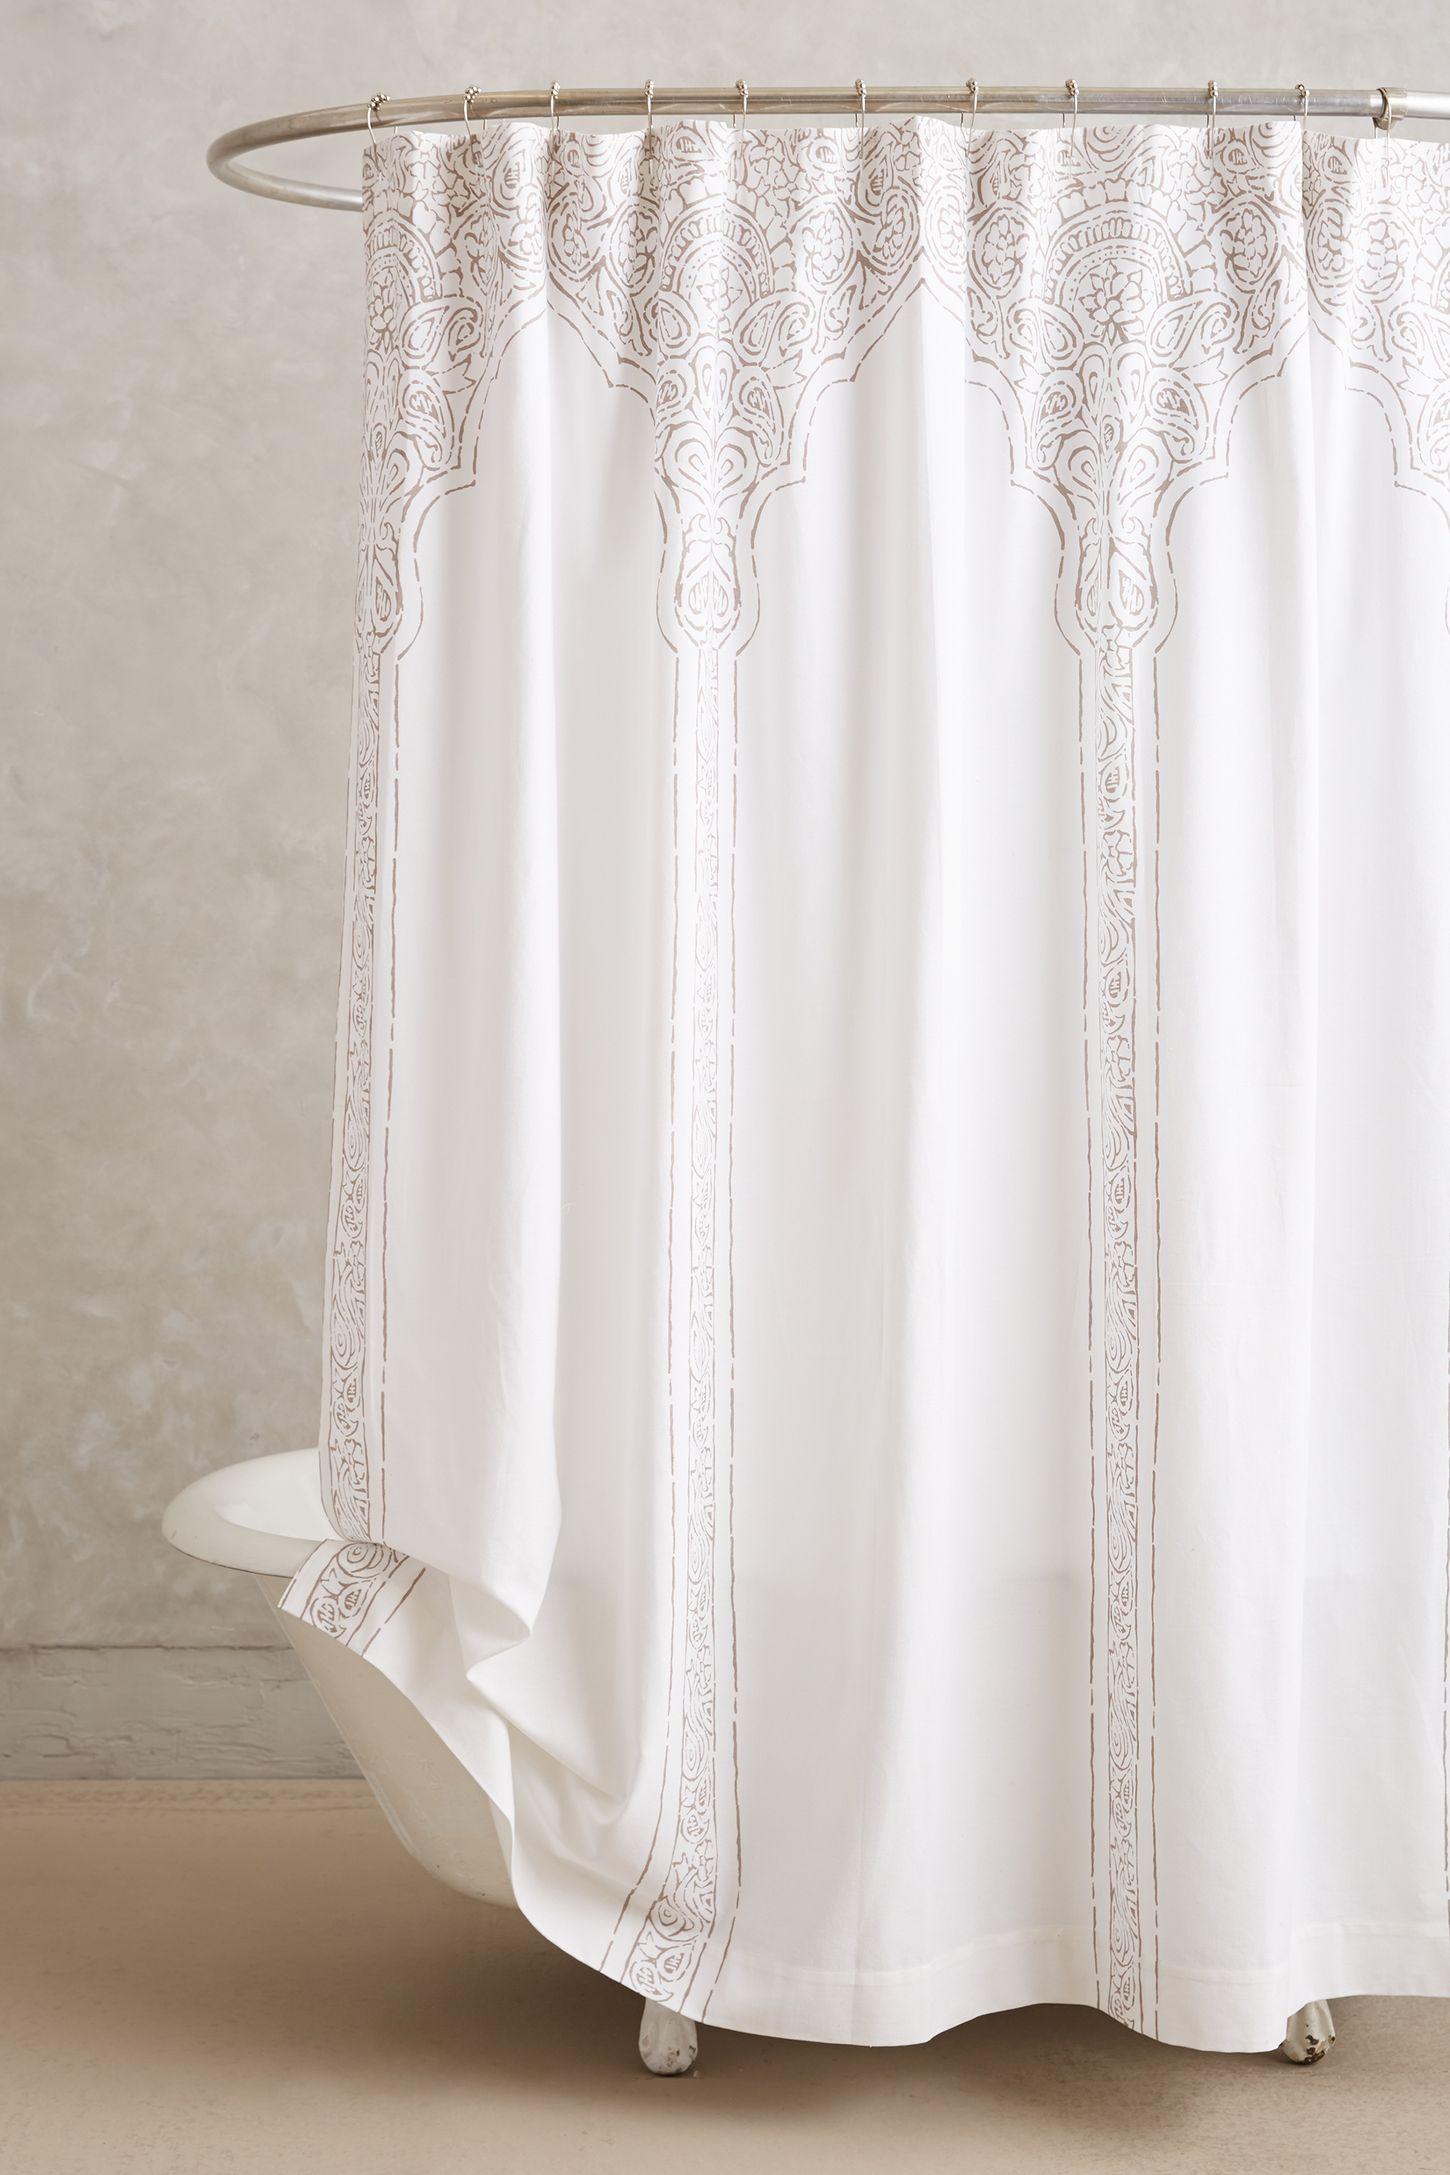 Anthropologie floral shower curtain - Anthropologie Floral Shower Curtain 43